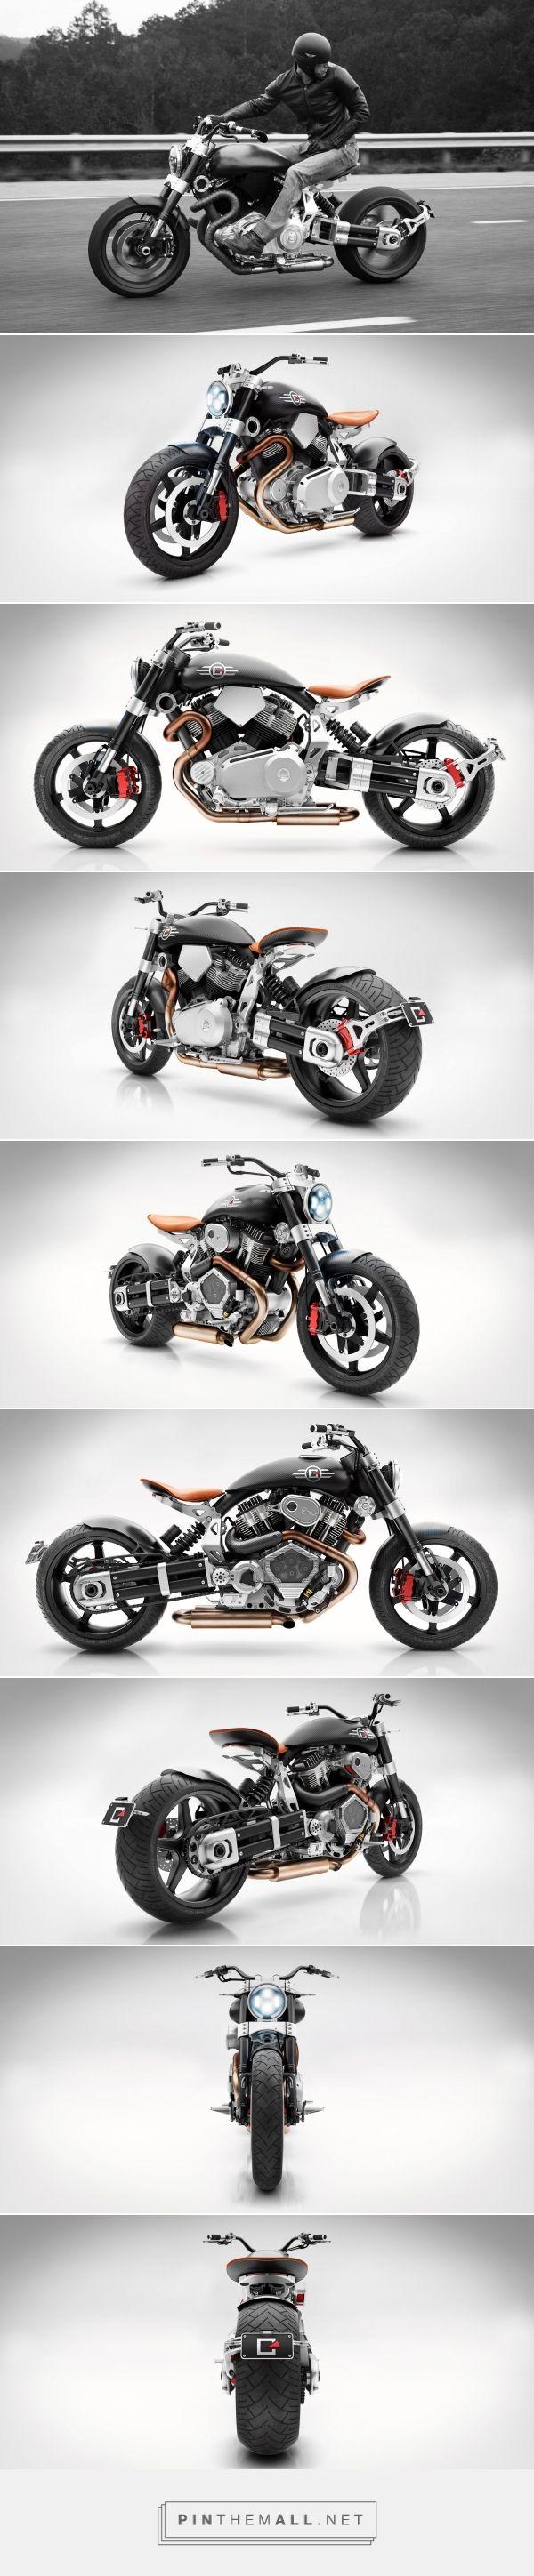 Hellcat | Confederate Motorcycles 69,500.00USD.... 헐...정식수입하면 8천만원 넘을듯....